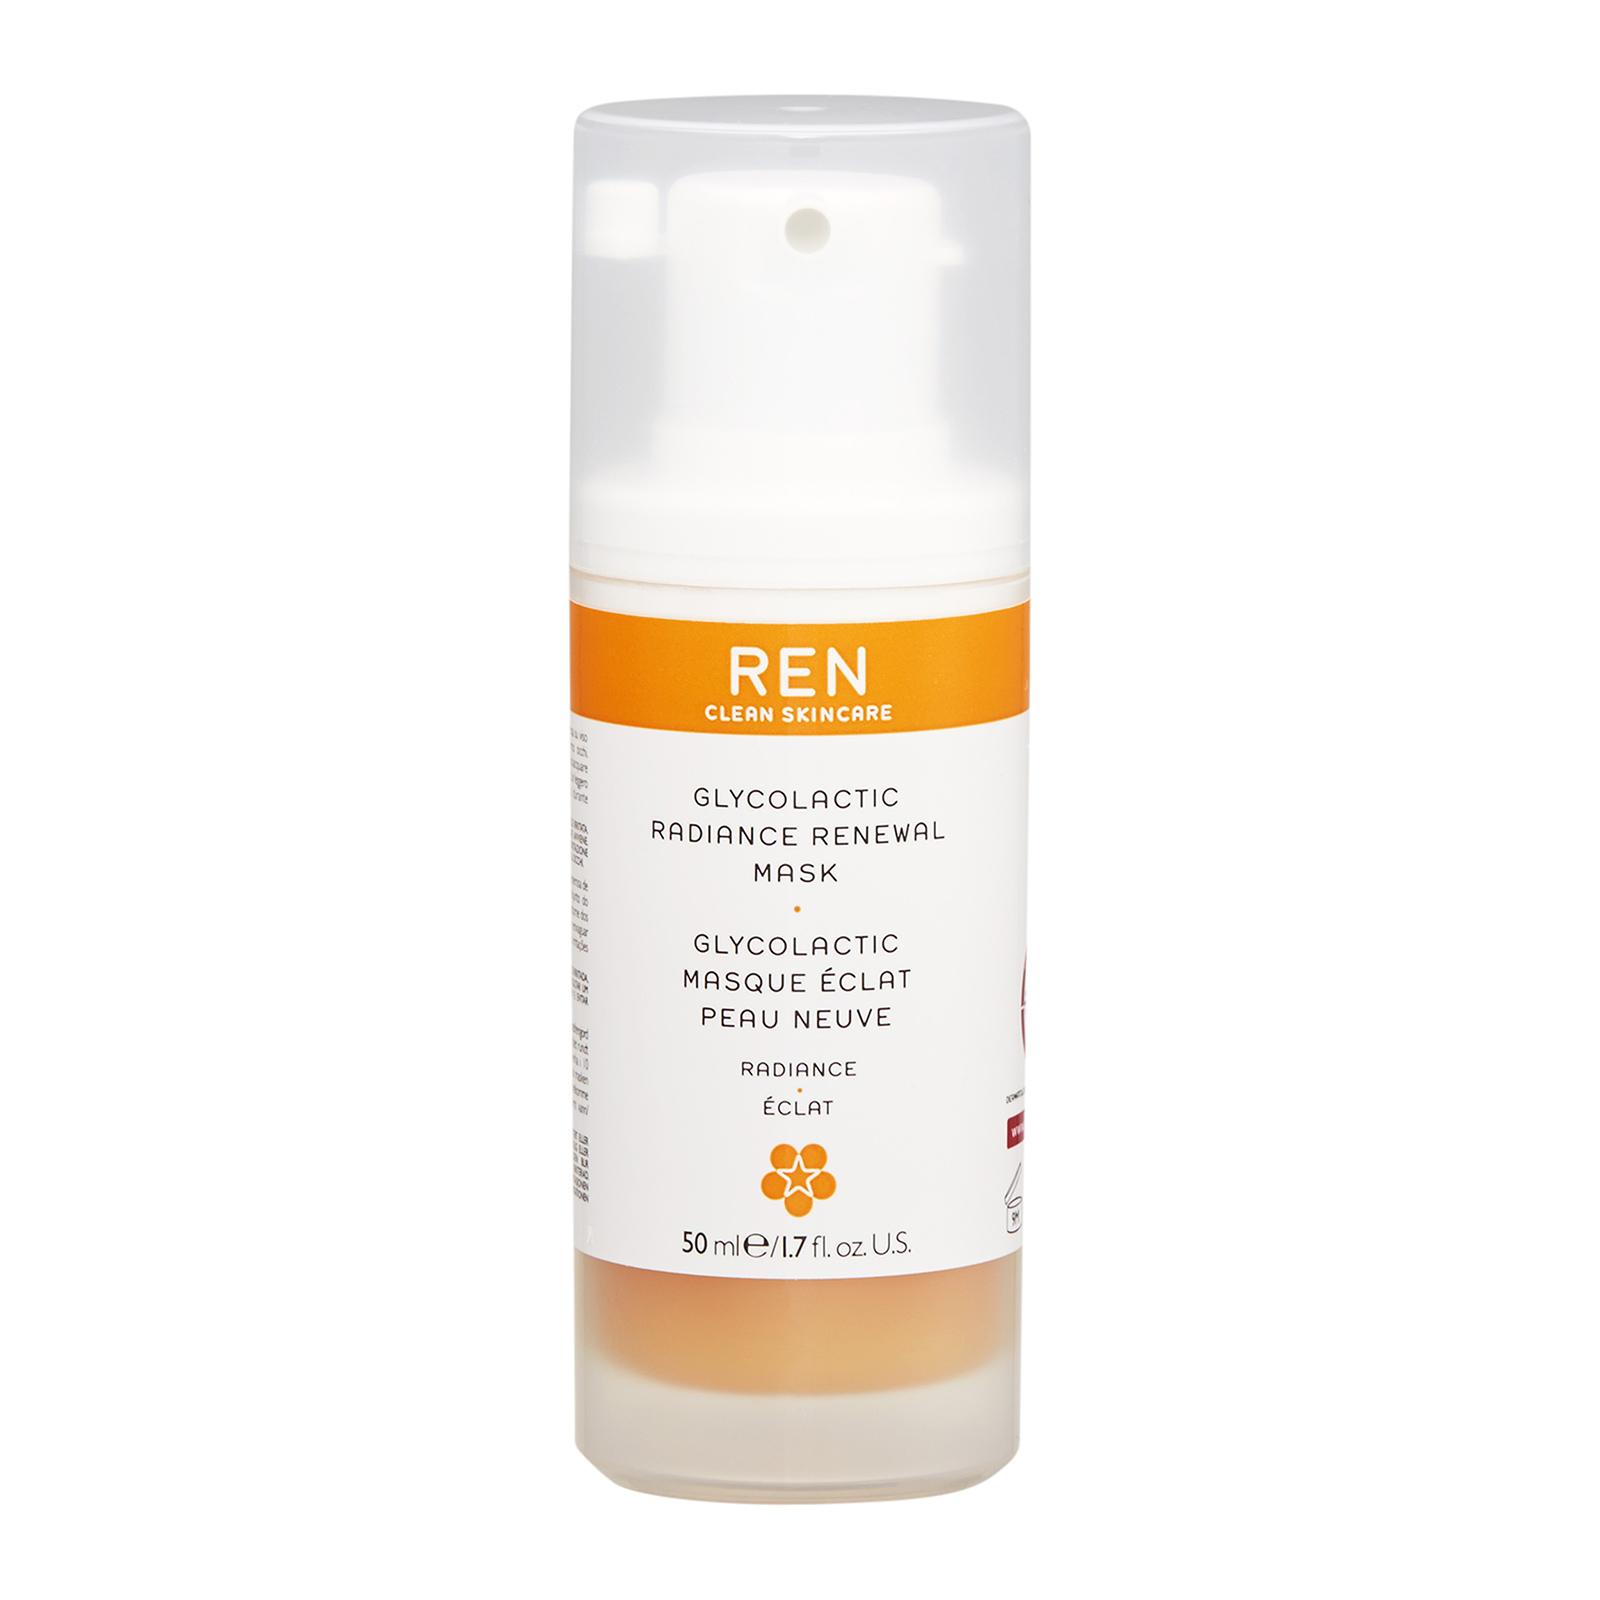 REN  Glycolactic Radiance Renewal Mask 1.7oz, 50ml